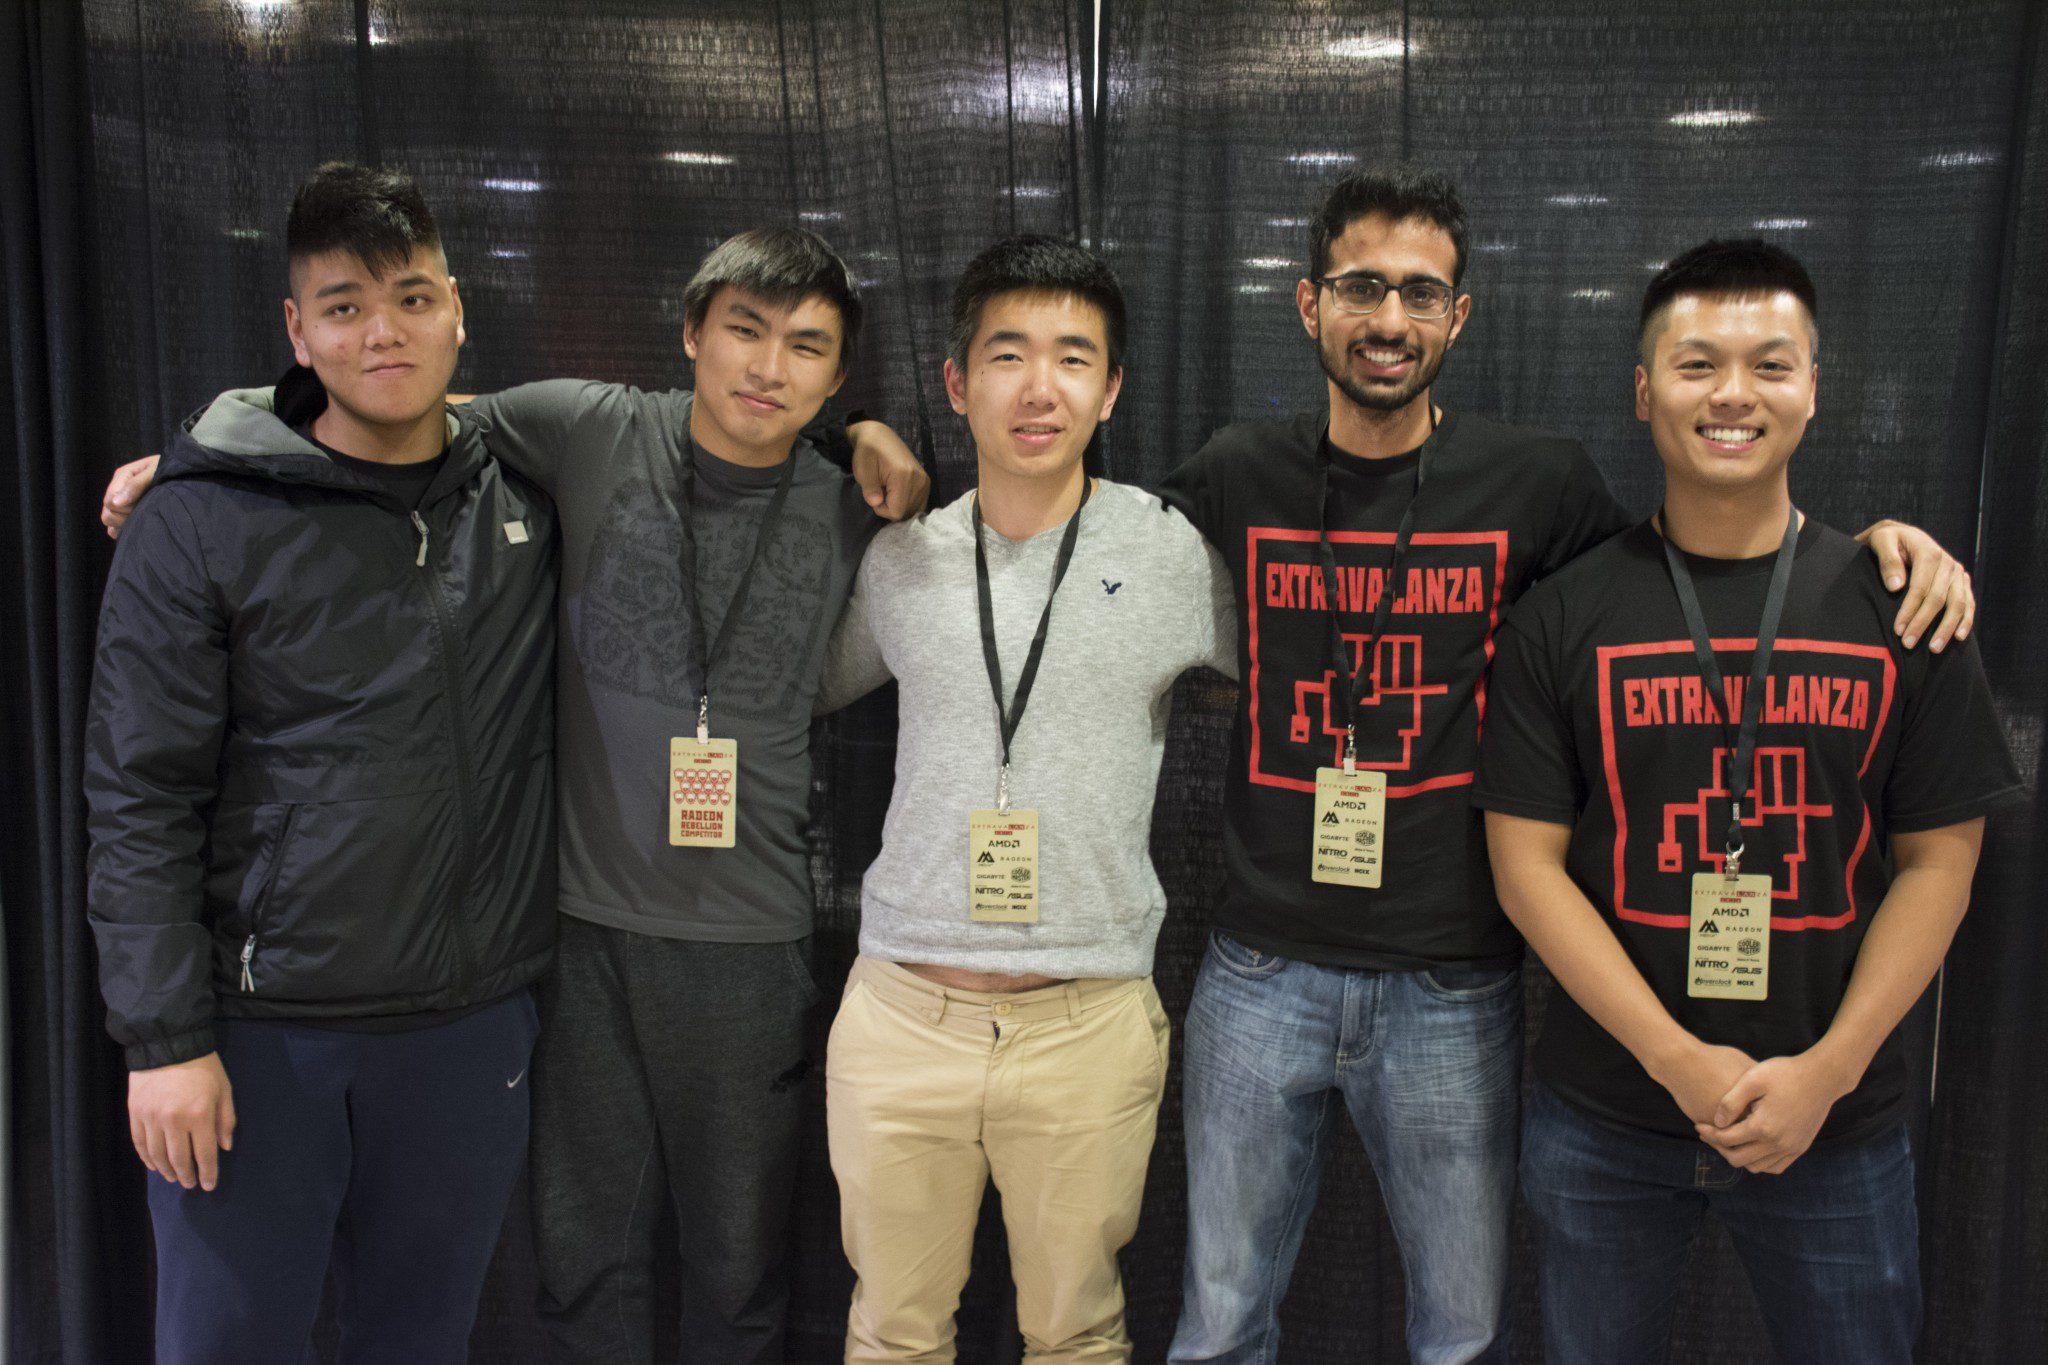 Michael Nguyen, Andy Tran, Kevin Shi, Haris Chaudhry, William Lam